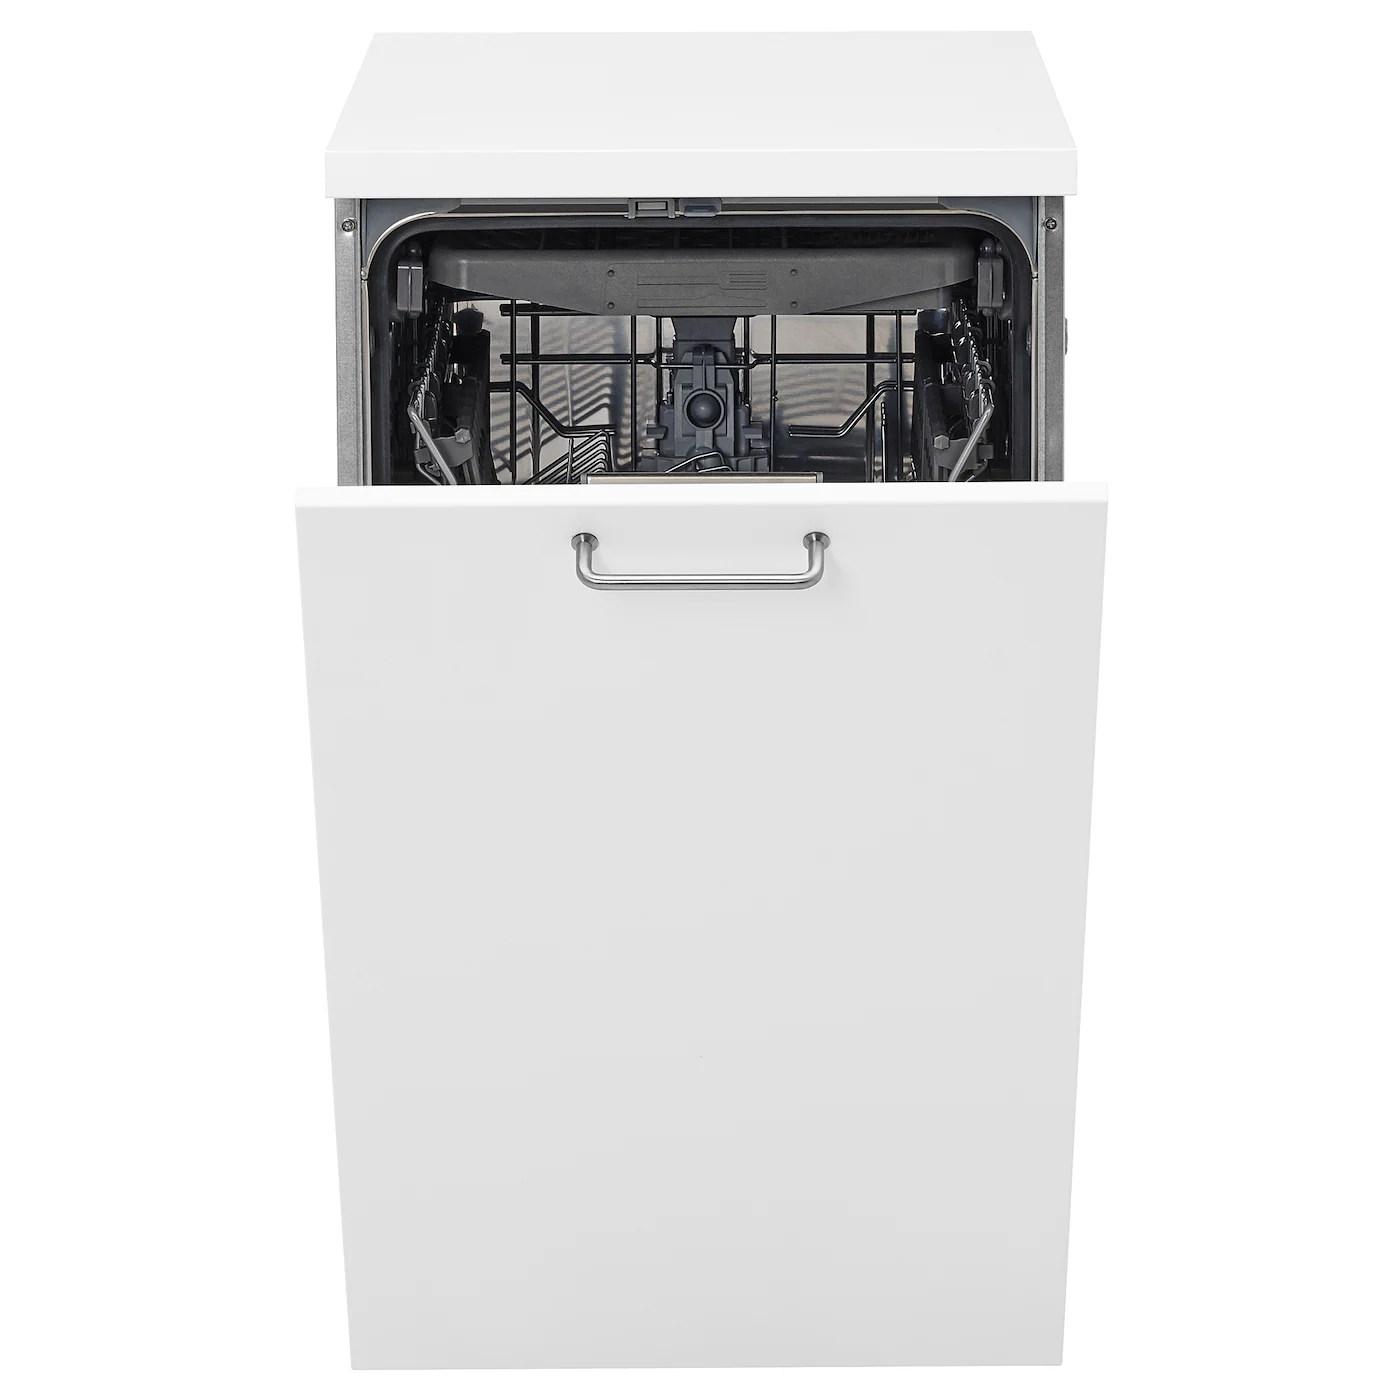 Finputsad Lave Vaisselle Encastrable Ikea 700 45 Cm Ikea